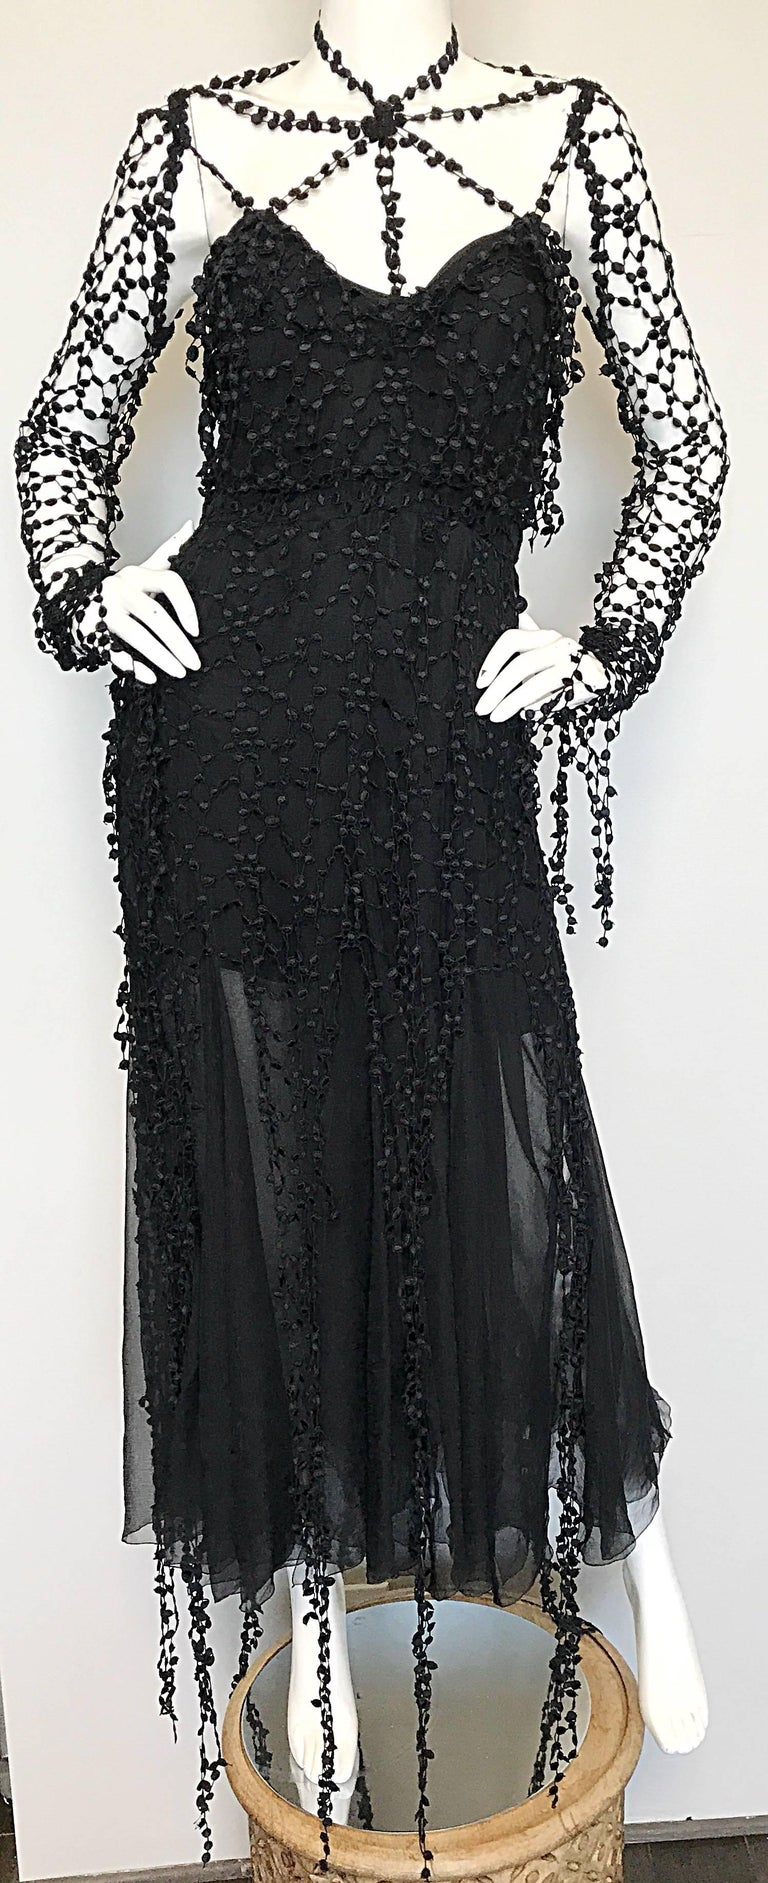 1990s Karl Lagerfeld Vintage ' Spiderweb ' Black Silk Chiffon Vintage 90s Dress For Sale 3